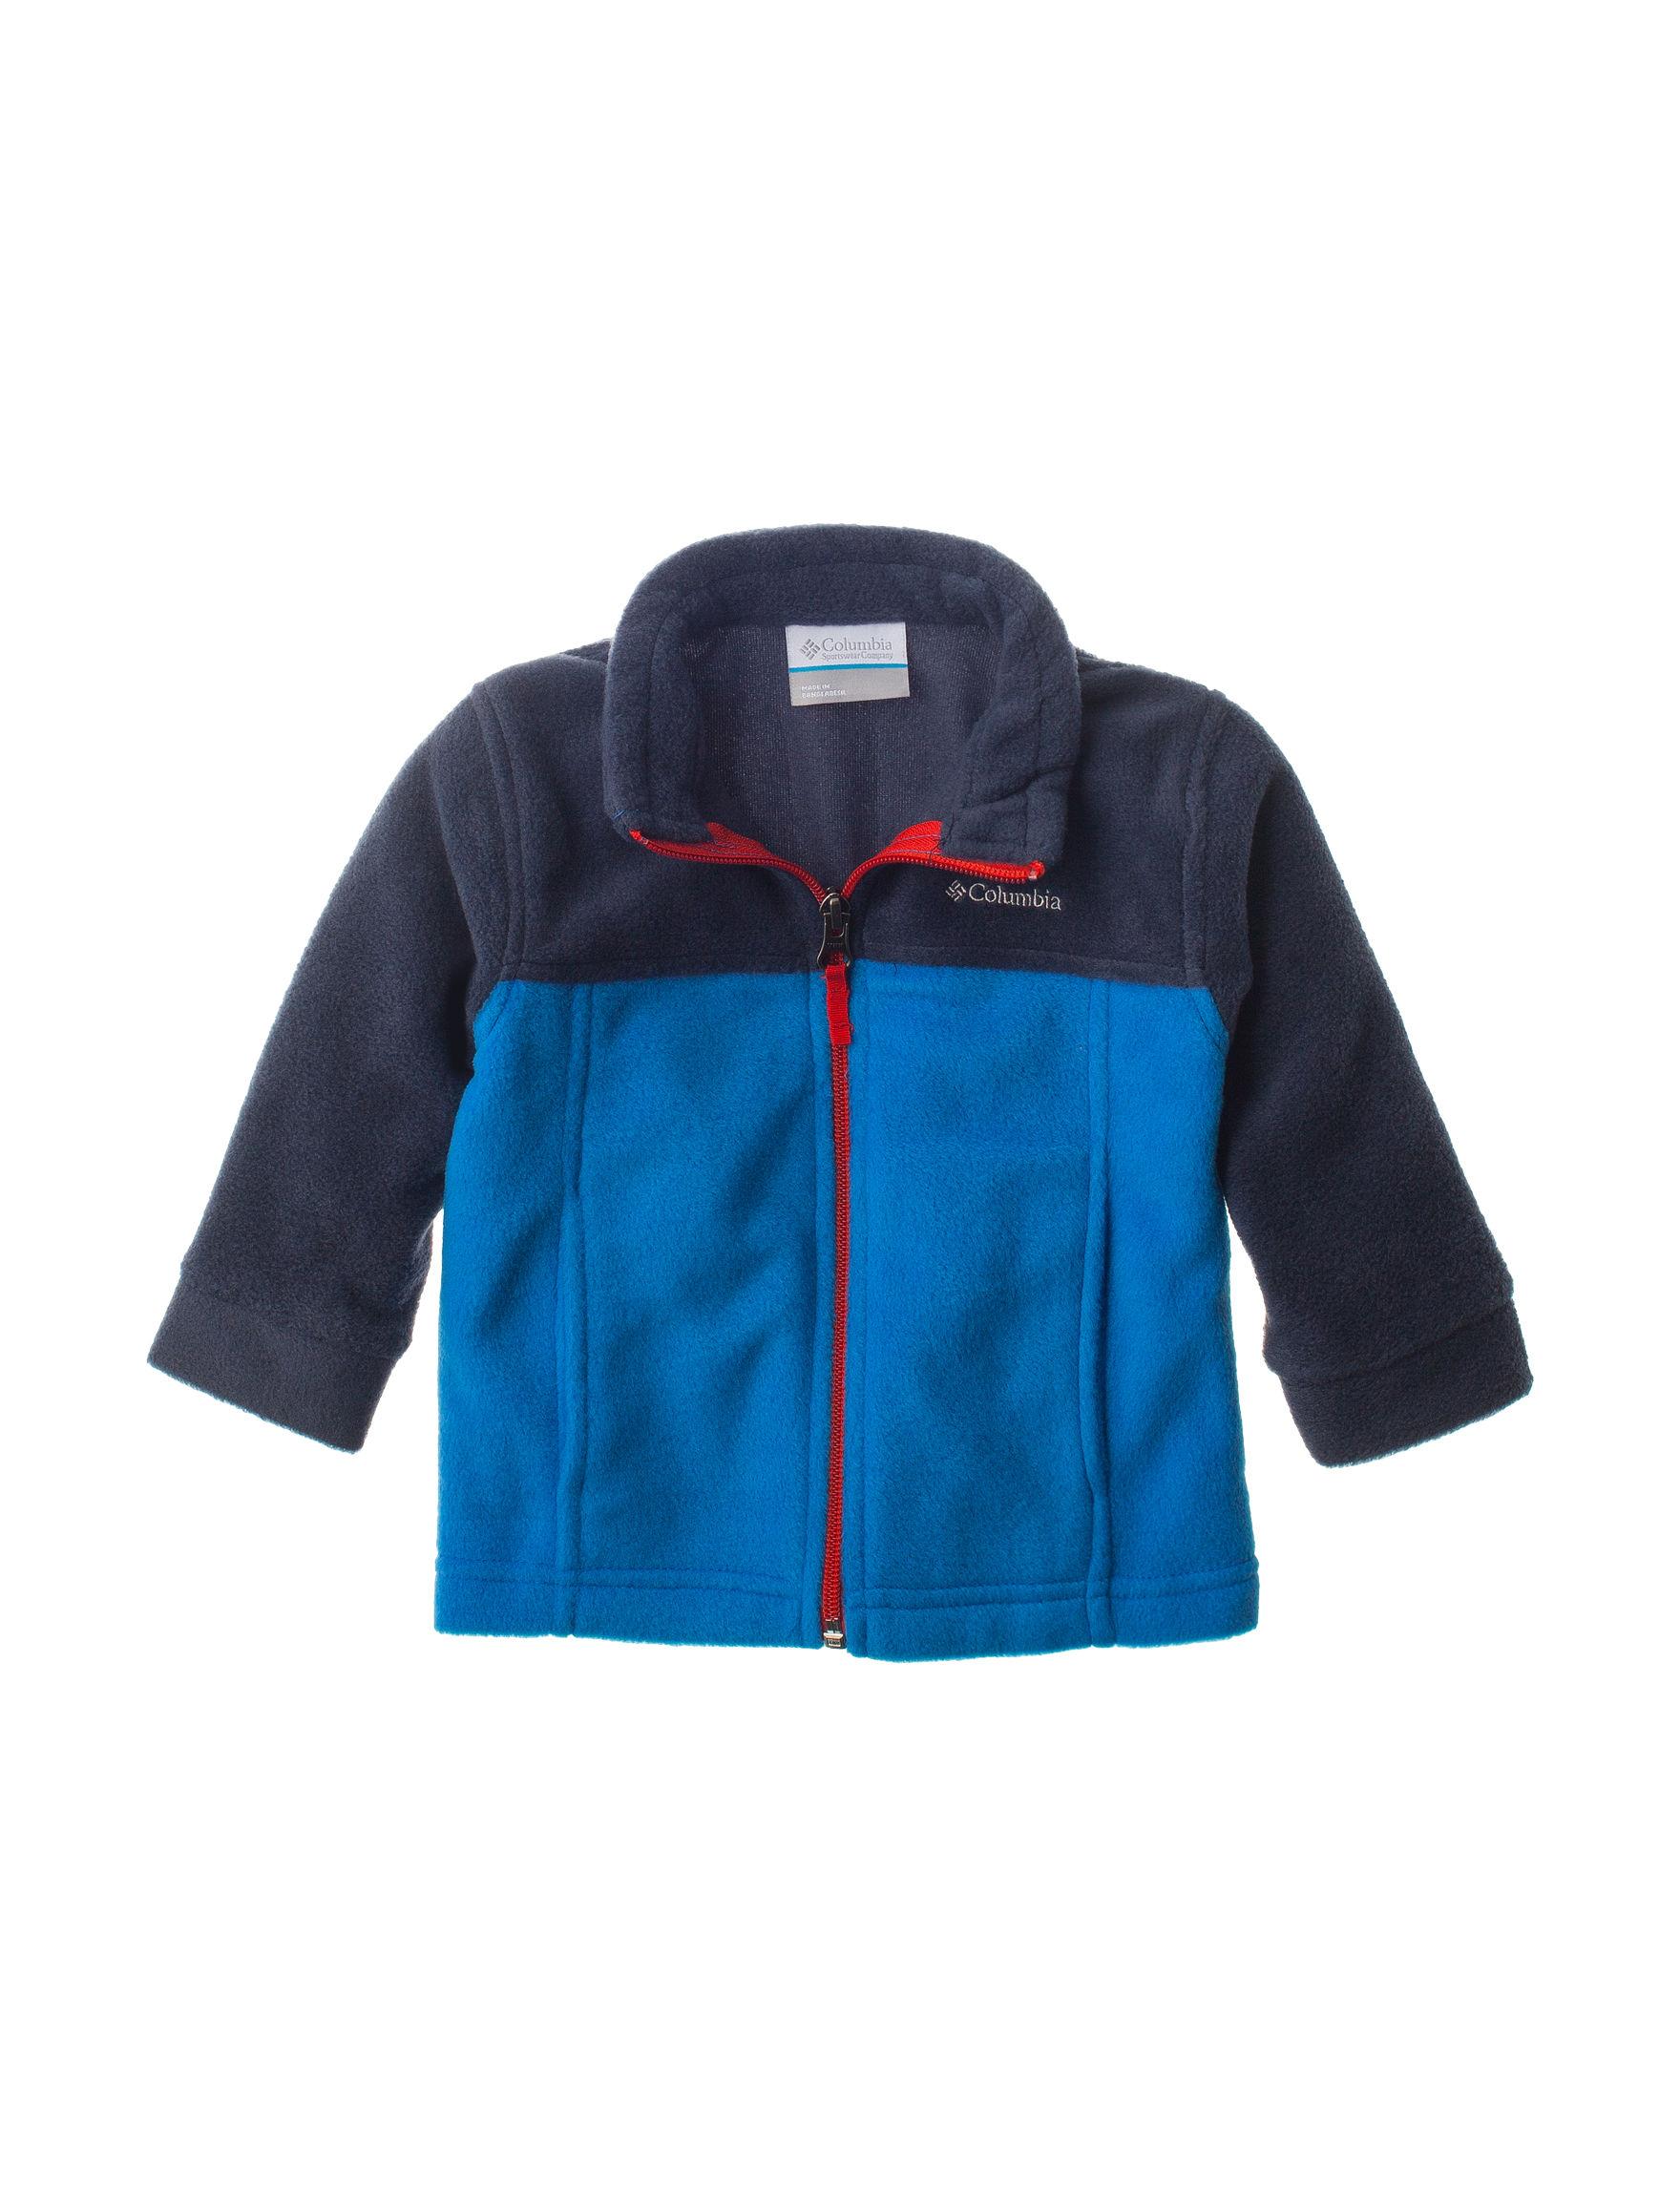 Columbia Super Blue Lightweight Jackets & Blazers